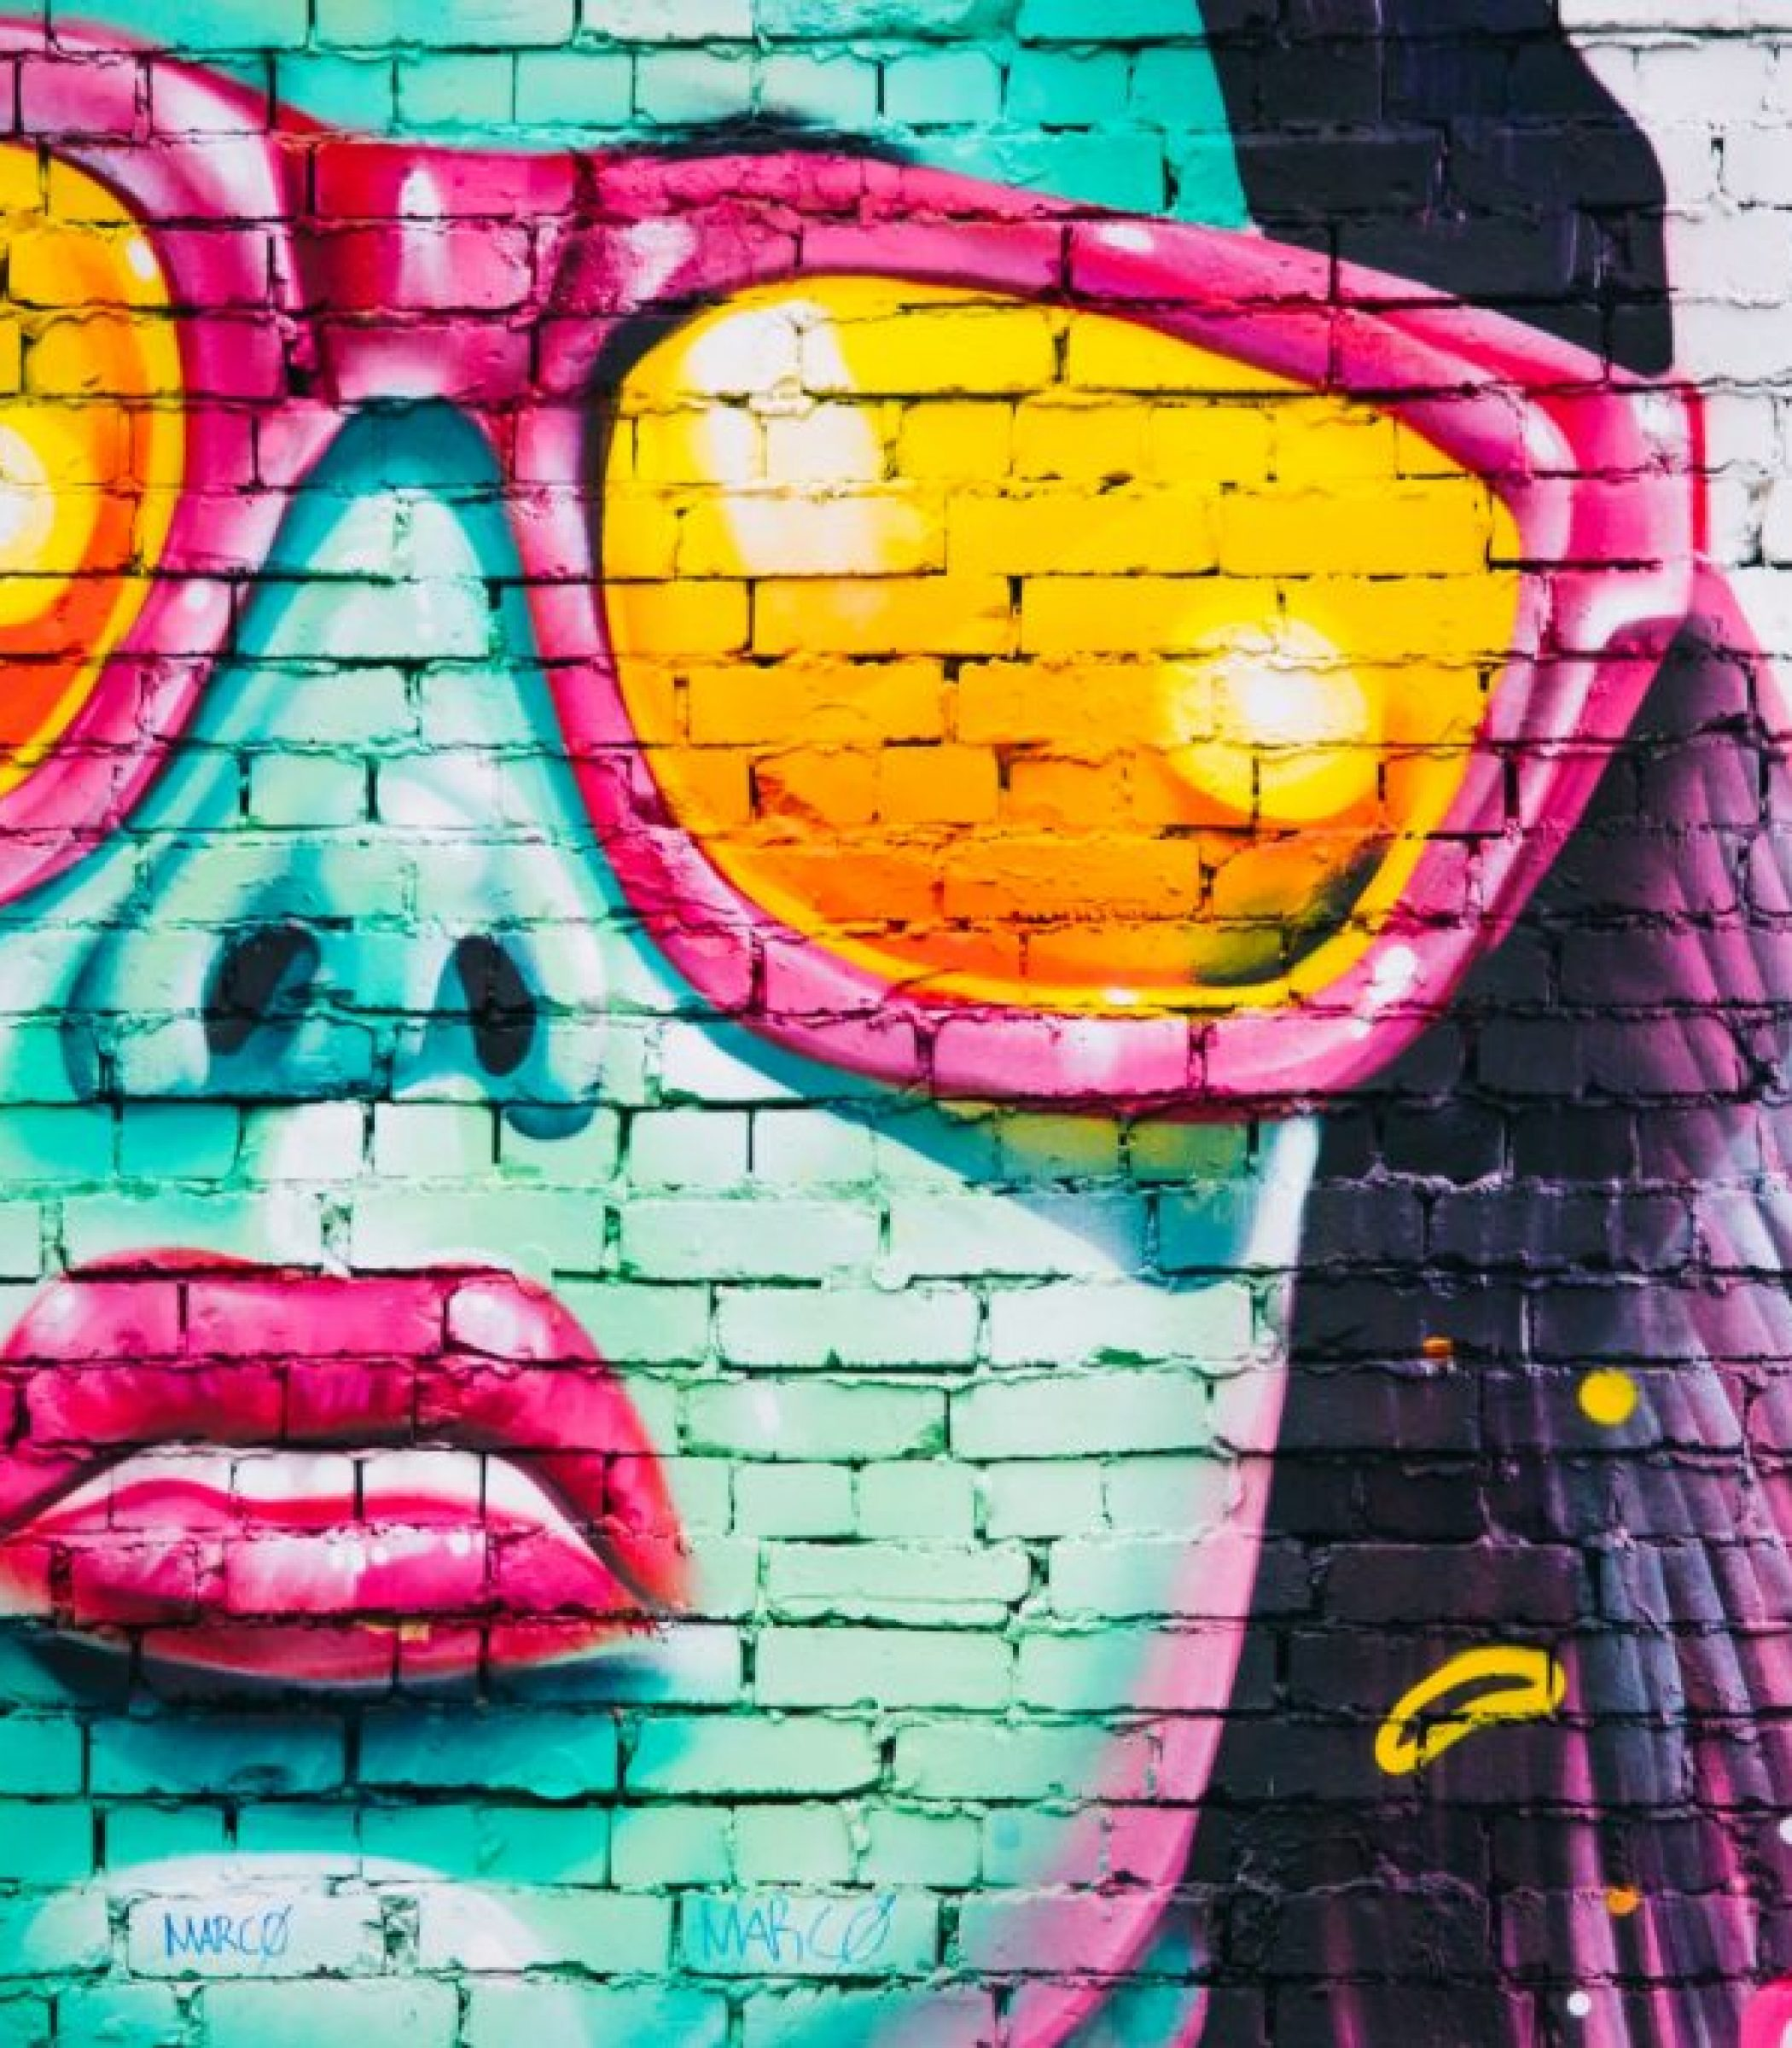 <strong>A Showcase of Street Art</strong>